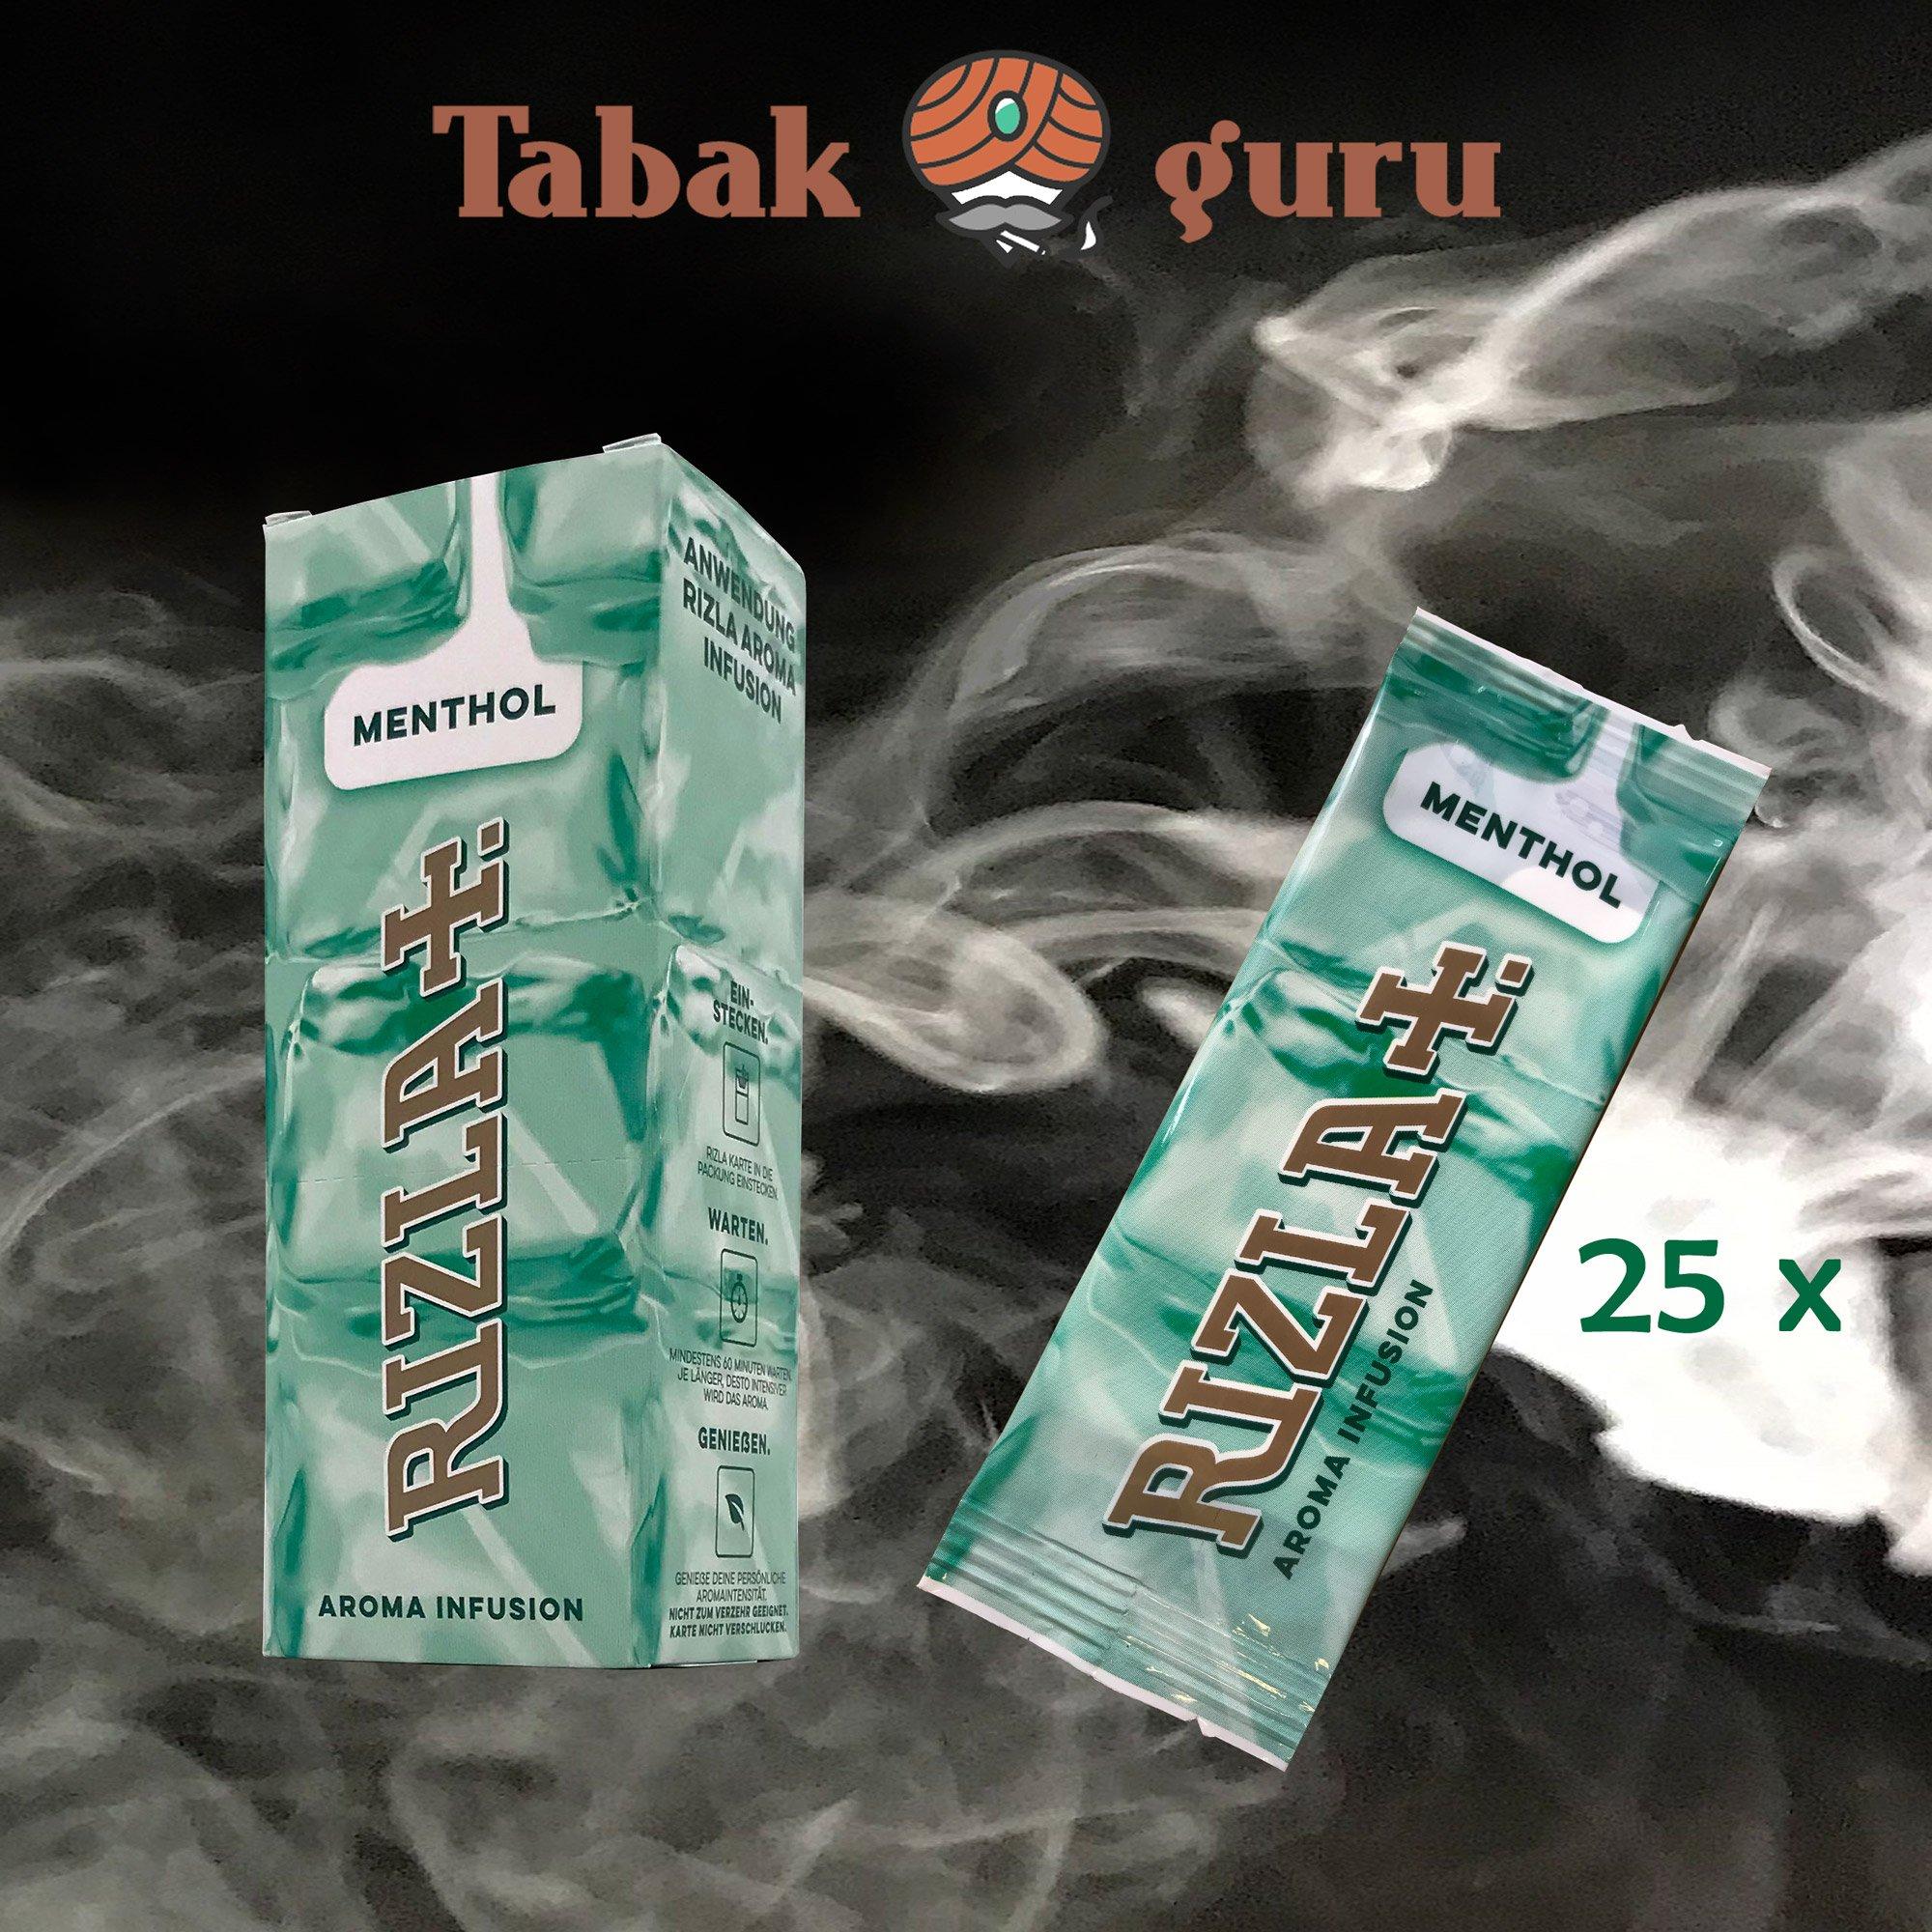 25 x Aromakarte Rizla+  MENTHOL Aroma Infusion